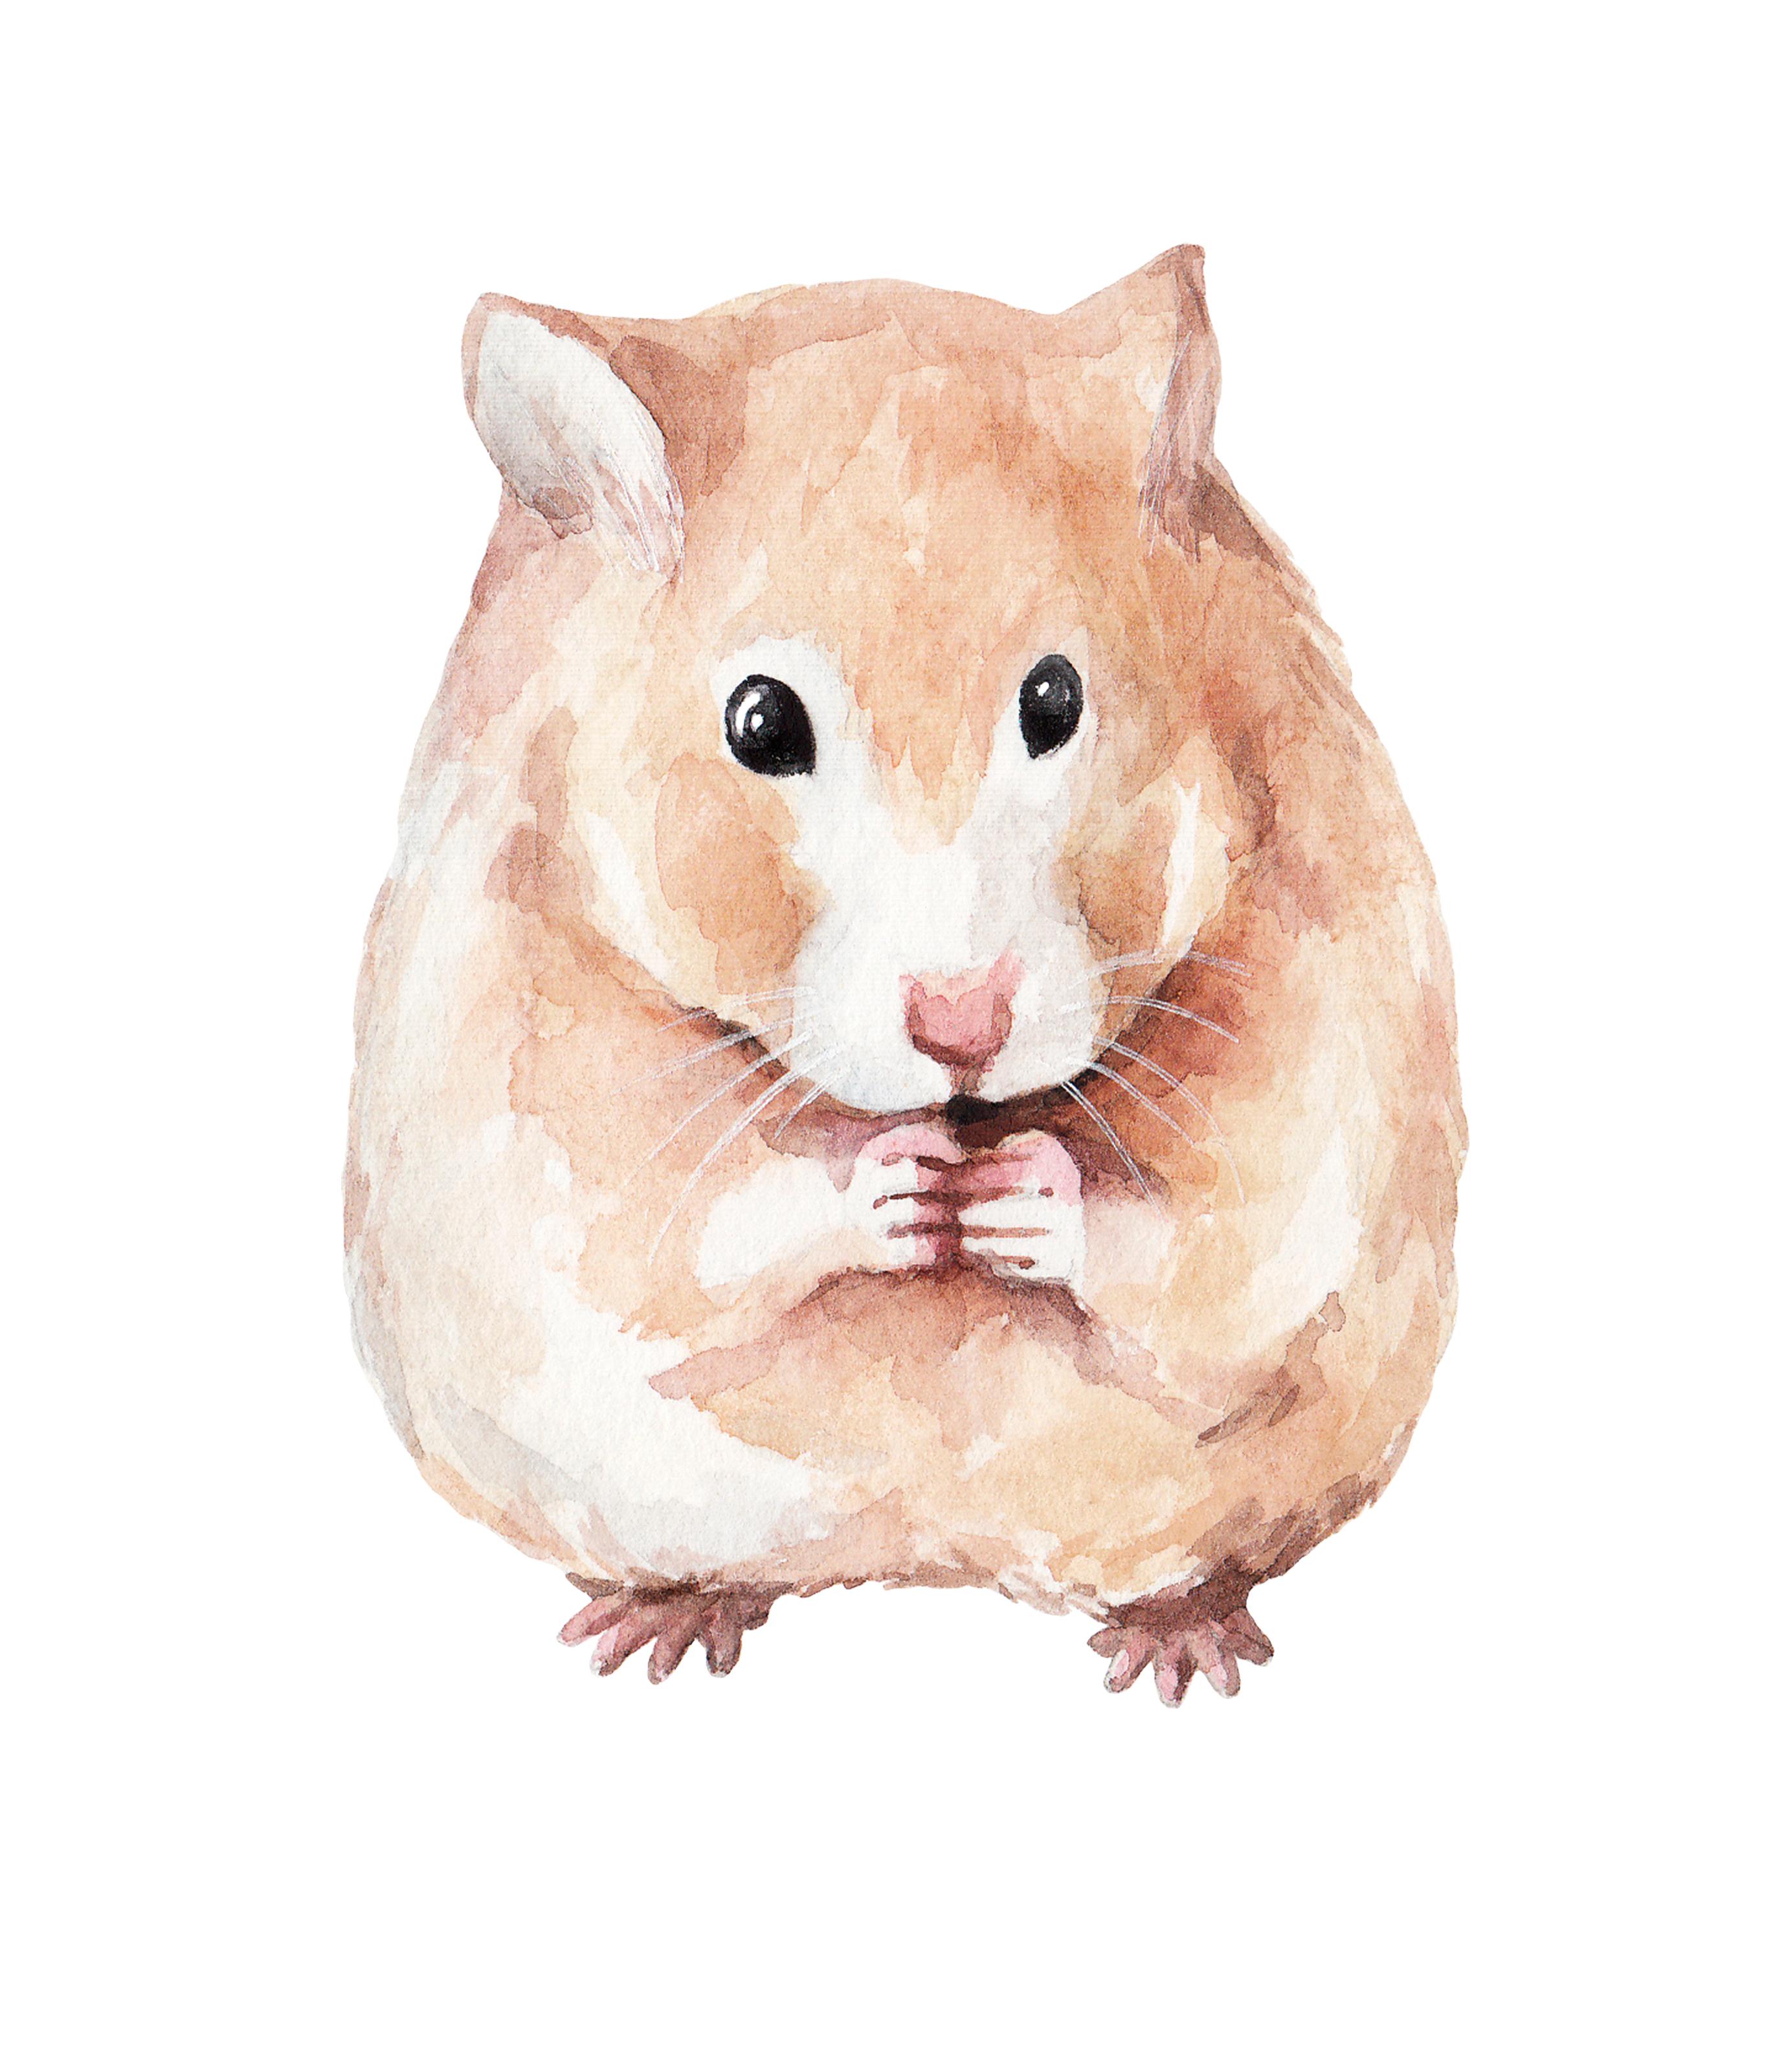 Gargantuan Hamster   New Monster for Fifth Edition